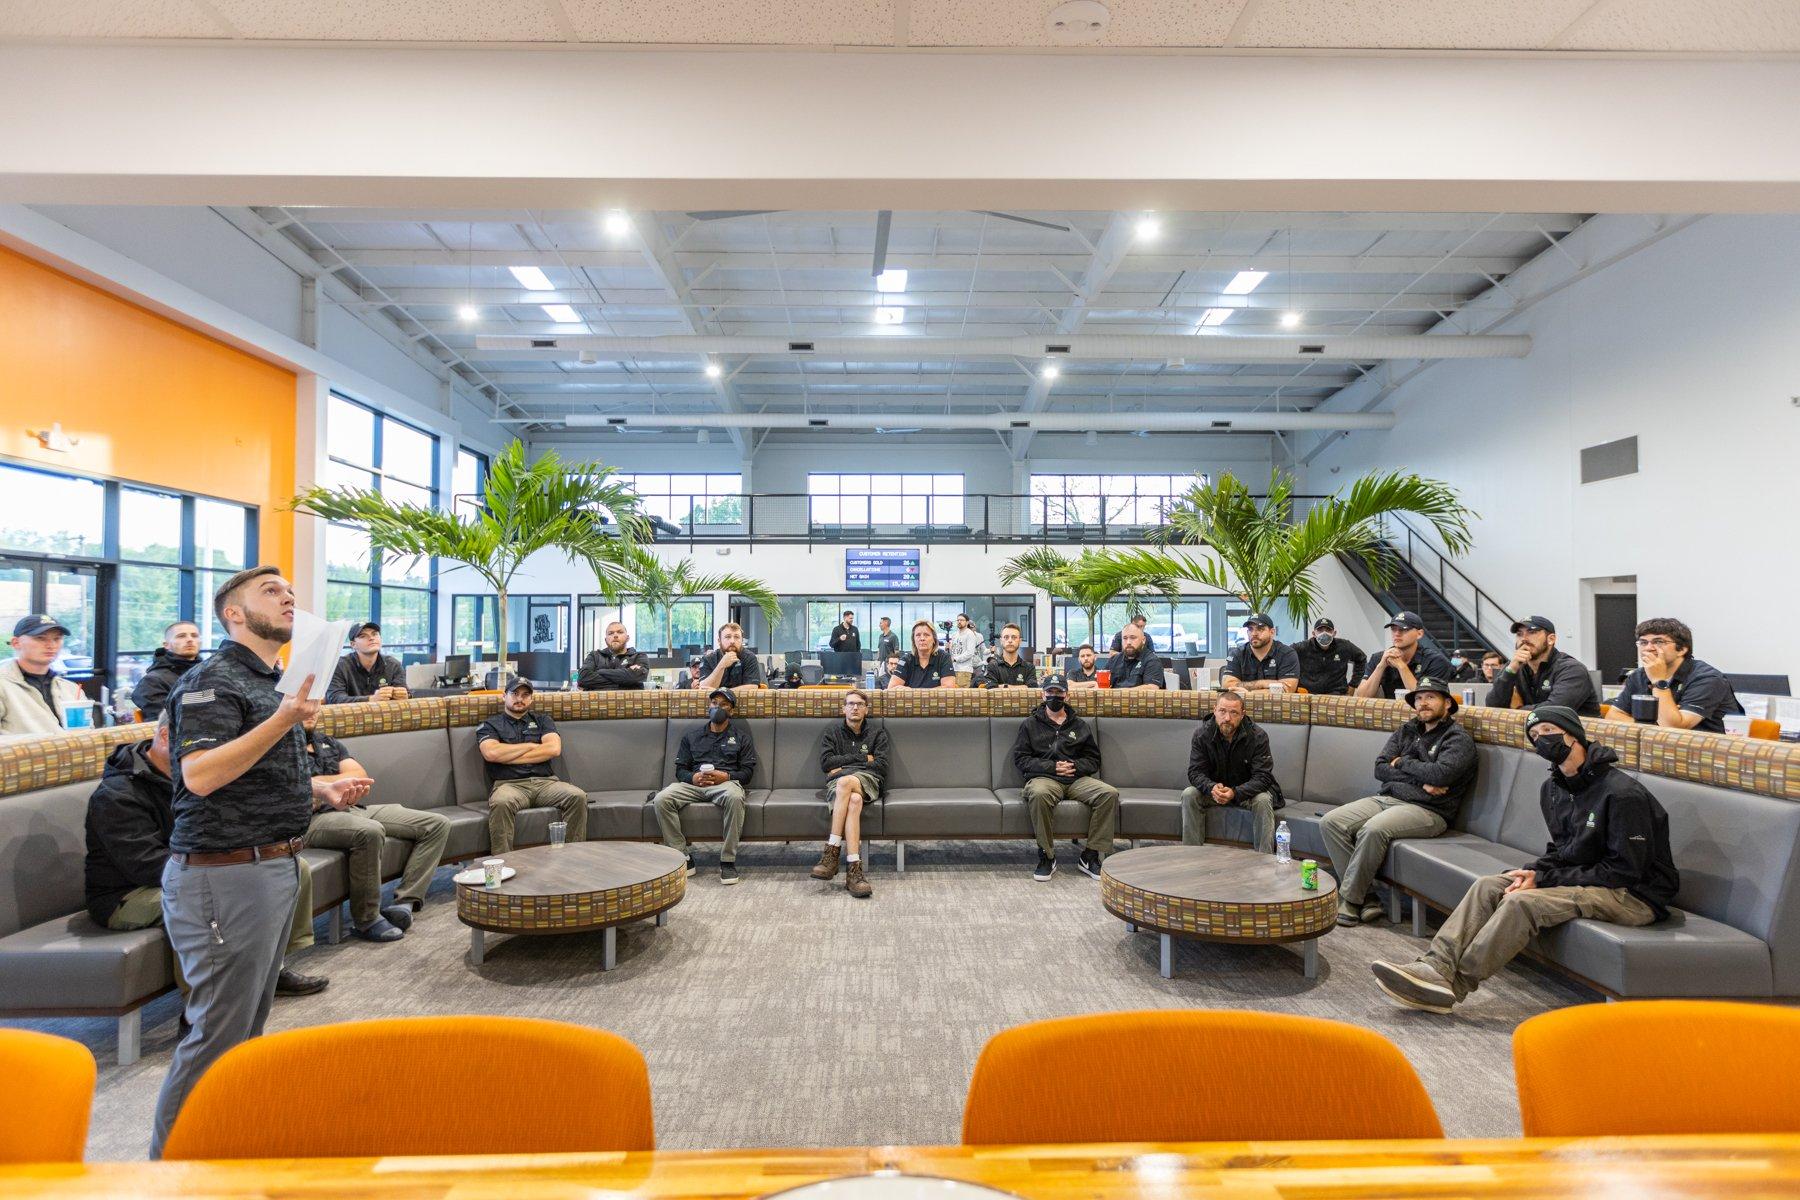 Oasis team meeting in new office building